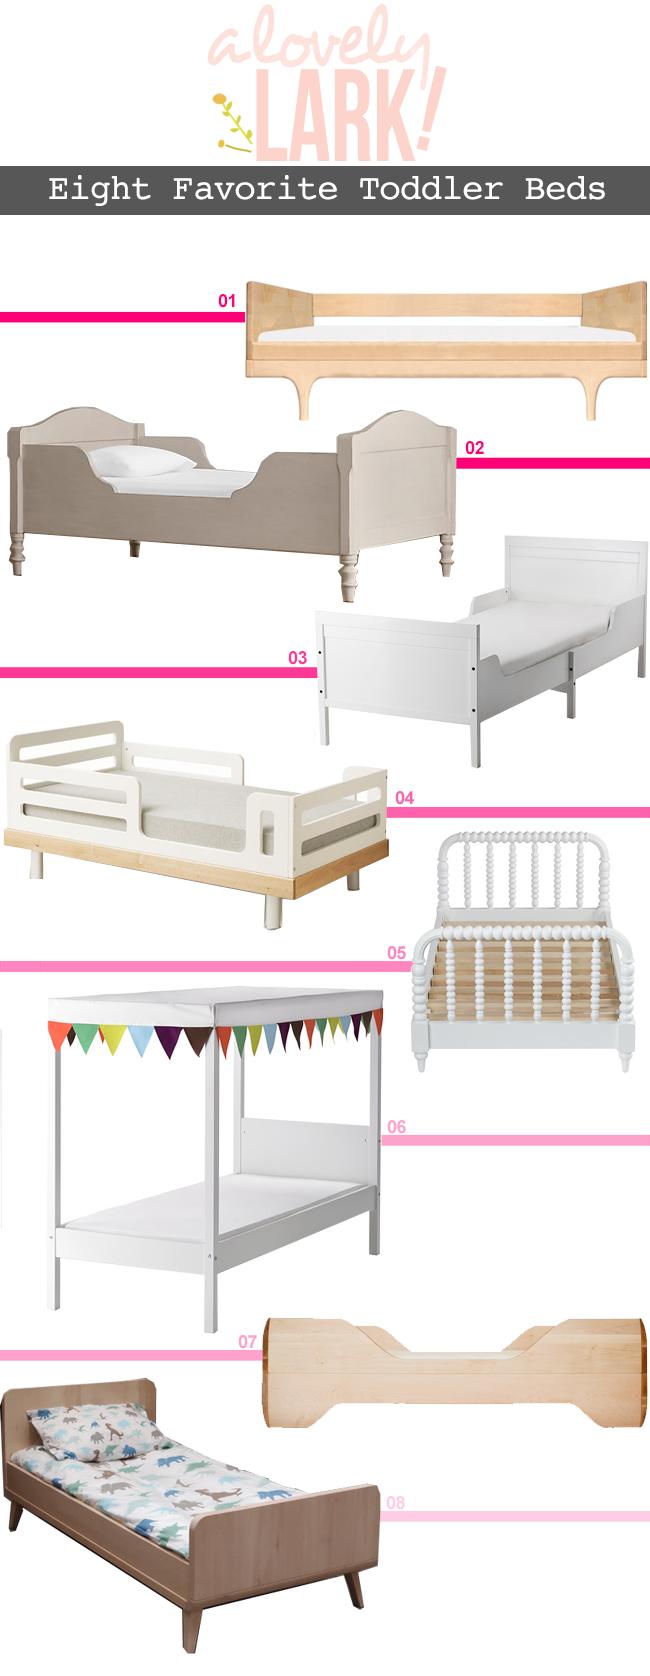 A-Lovely-Lark-Favorite-Toddler-Beds